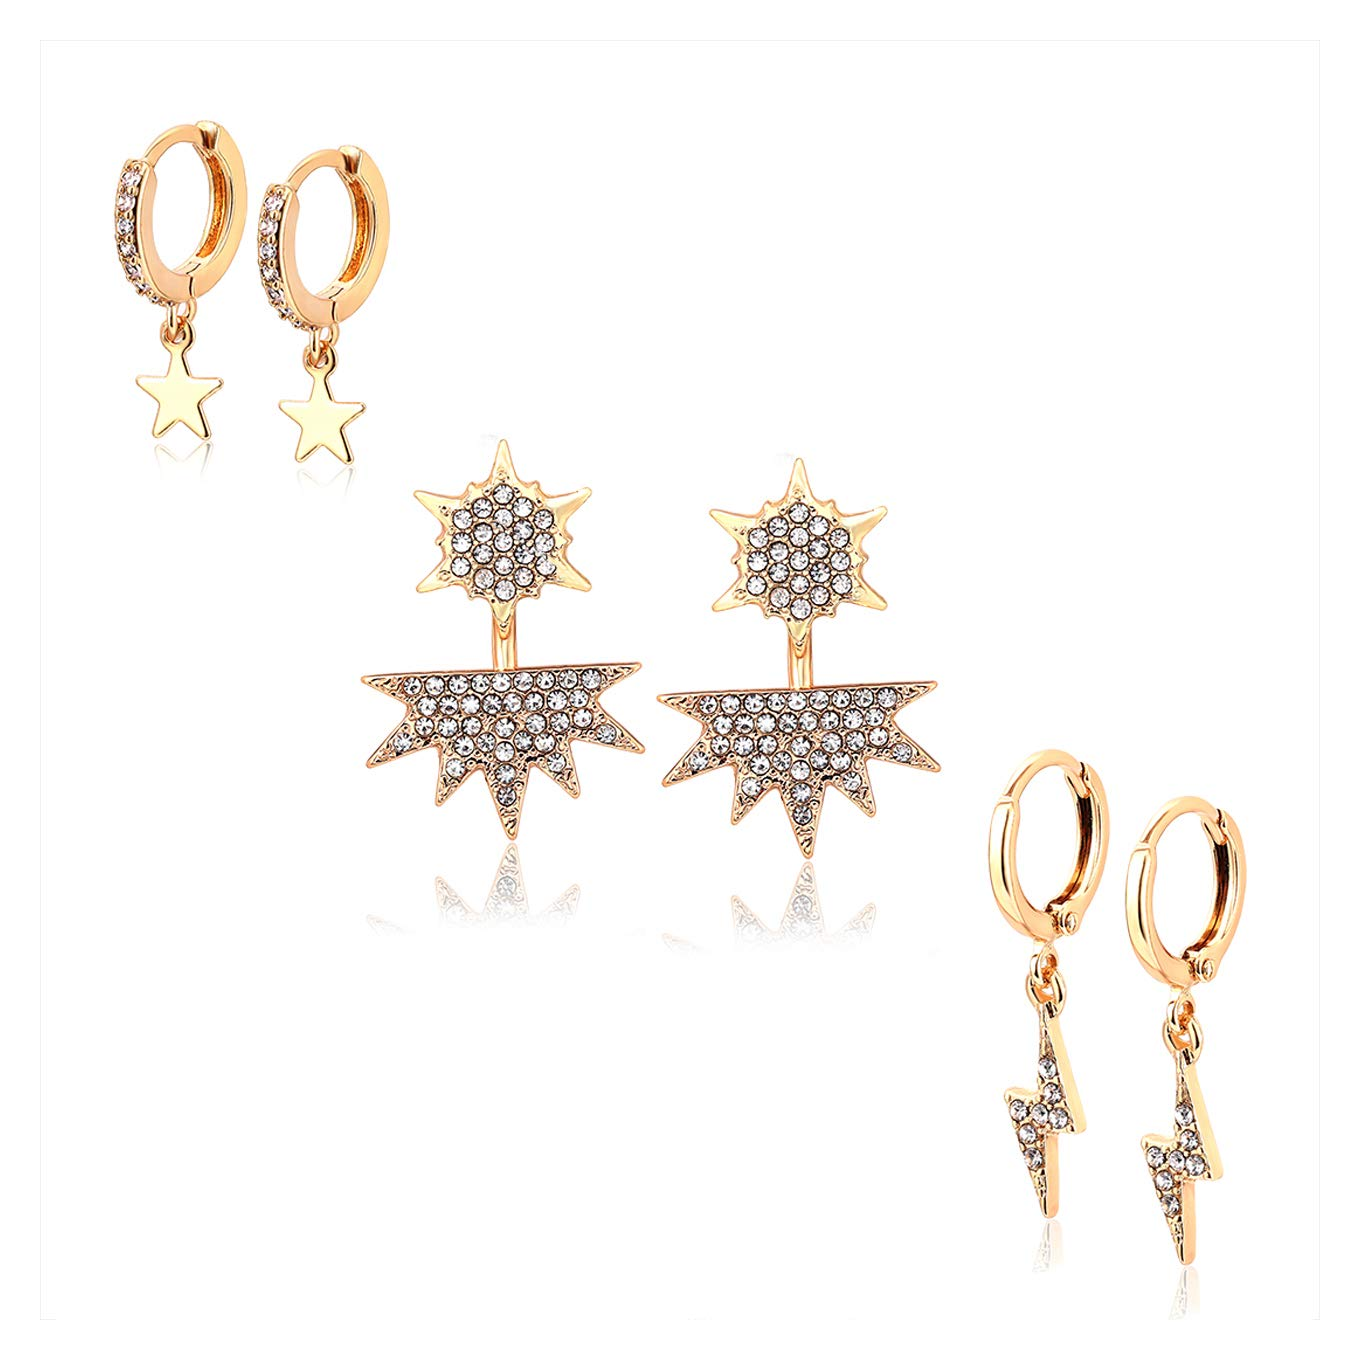 8ff0af1fa Amazon.com: BSJELL Dangle Earrings Sets for Women Huggie Hoop Earrings Tiny  Star Crystal Lightning Bolt Wedding Ear Jacket Stud Set Fashion Jewelry 3  Pairs ...